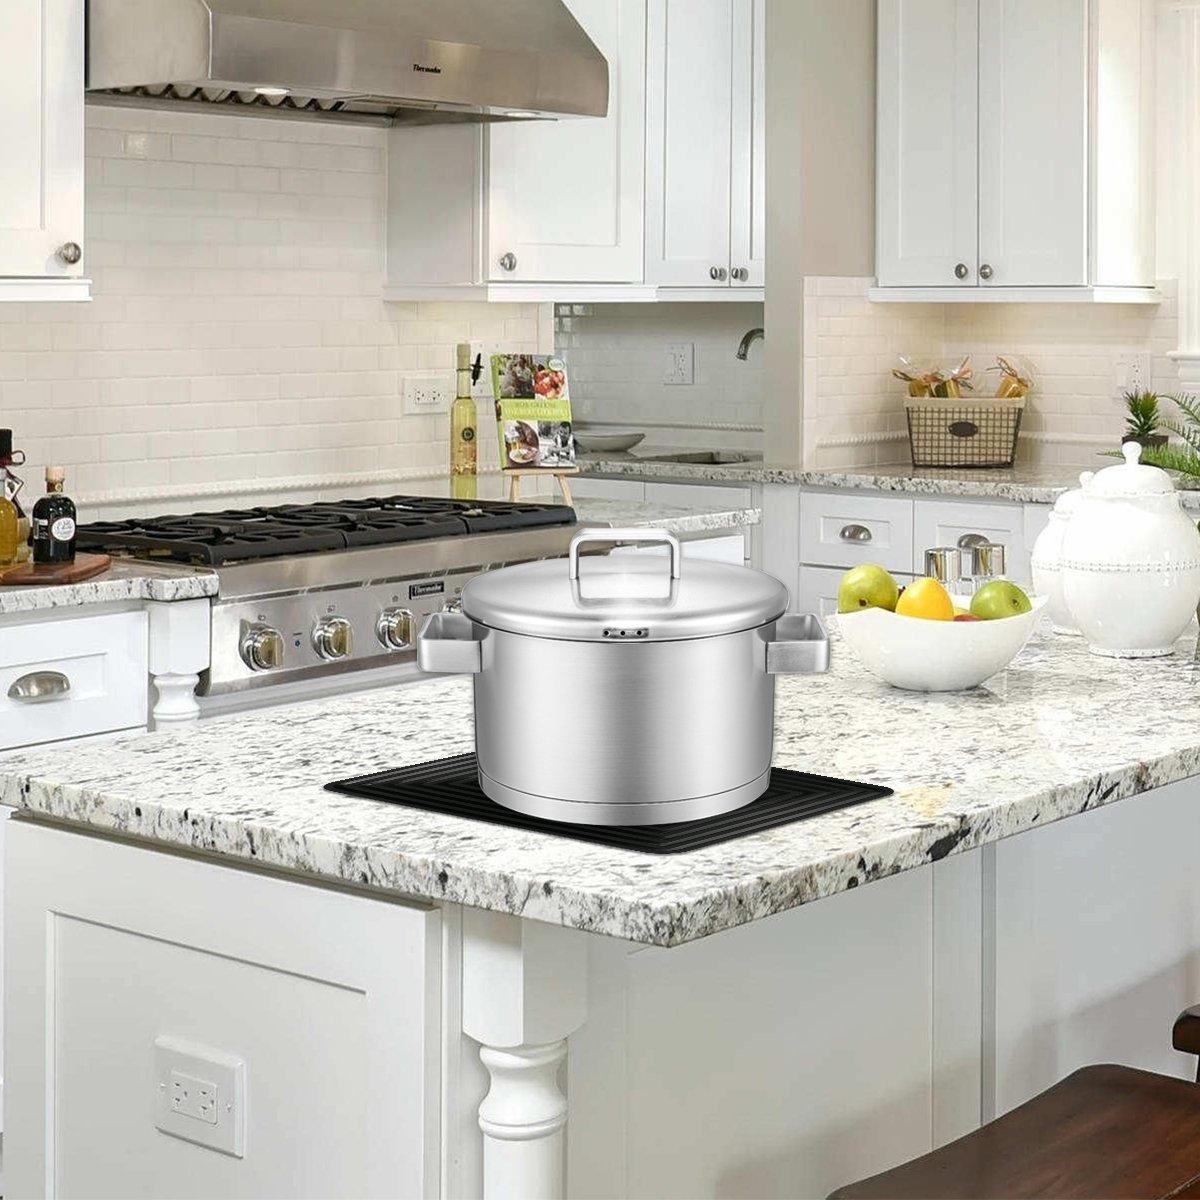 2 Pack,Silicone Trivet Mats/Hot Pads,Pot Holder,9''x12'' Non Slip Flexible Durable Heat Resistant Pot Coaster Kitchen Table Mats (Black) by LogHog (Image #2)